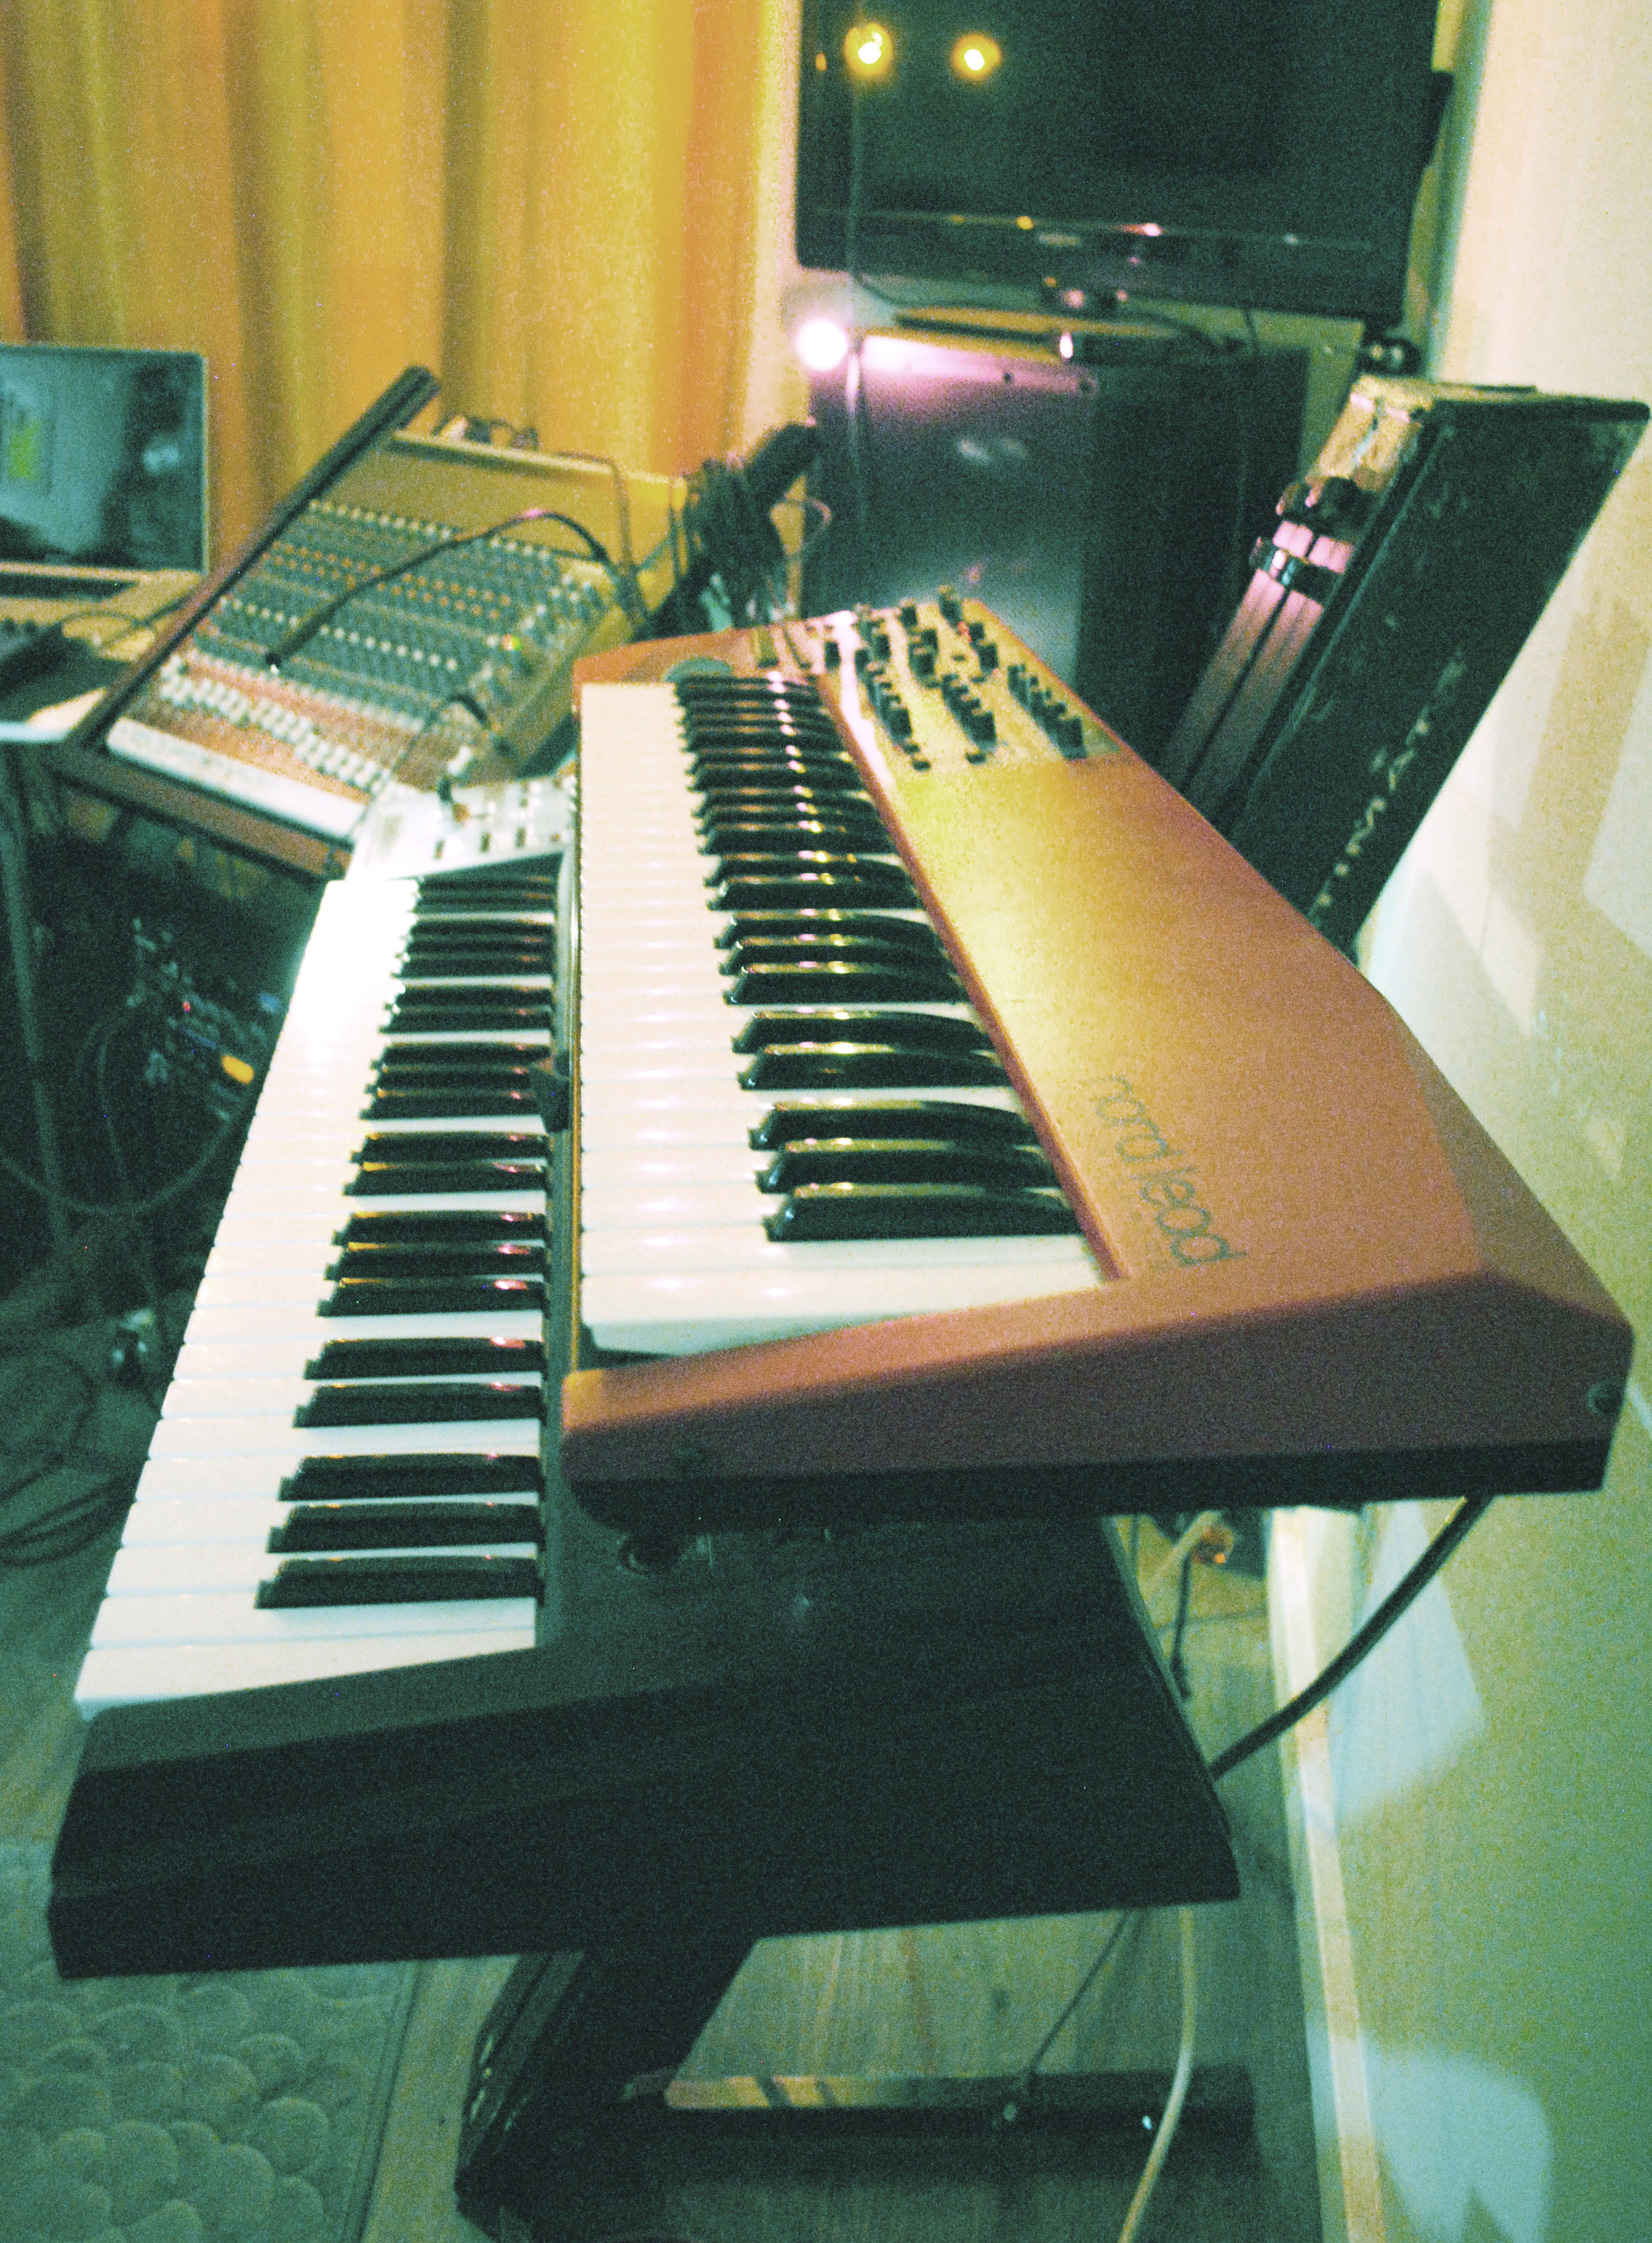 sxsw,austin,electronic musicsxsw,aus